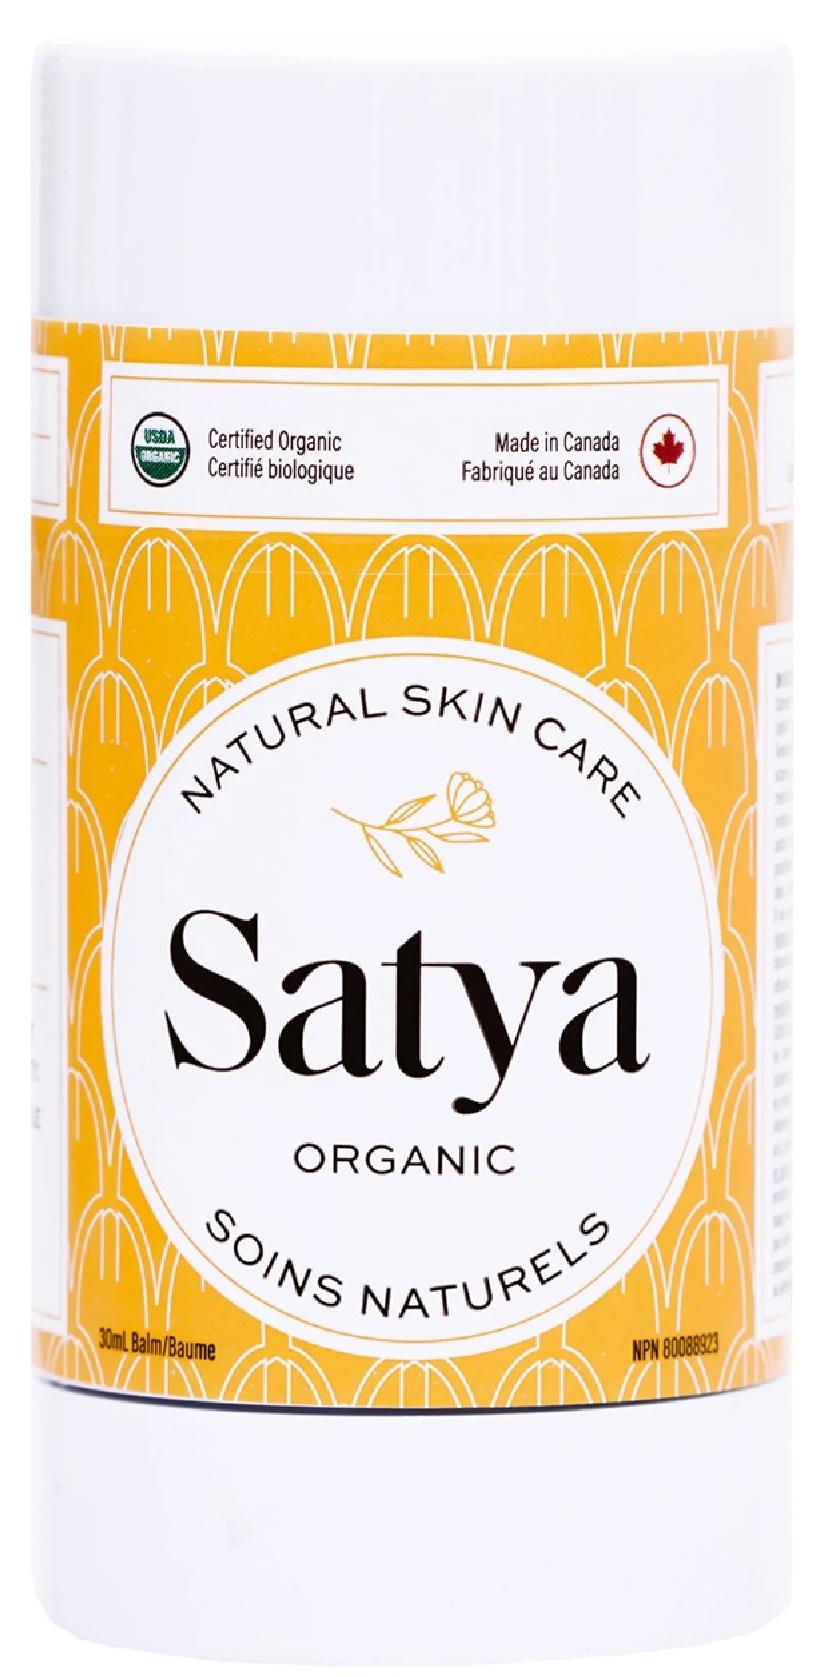 Satya eczema stick.